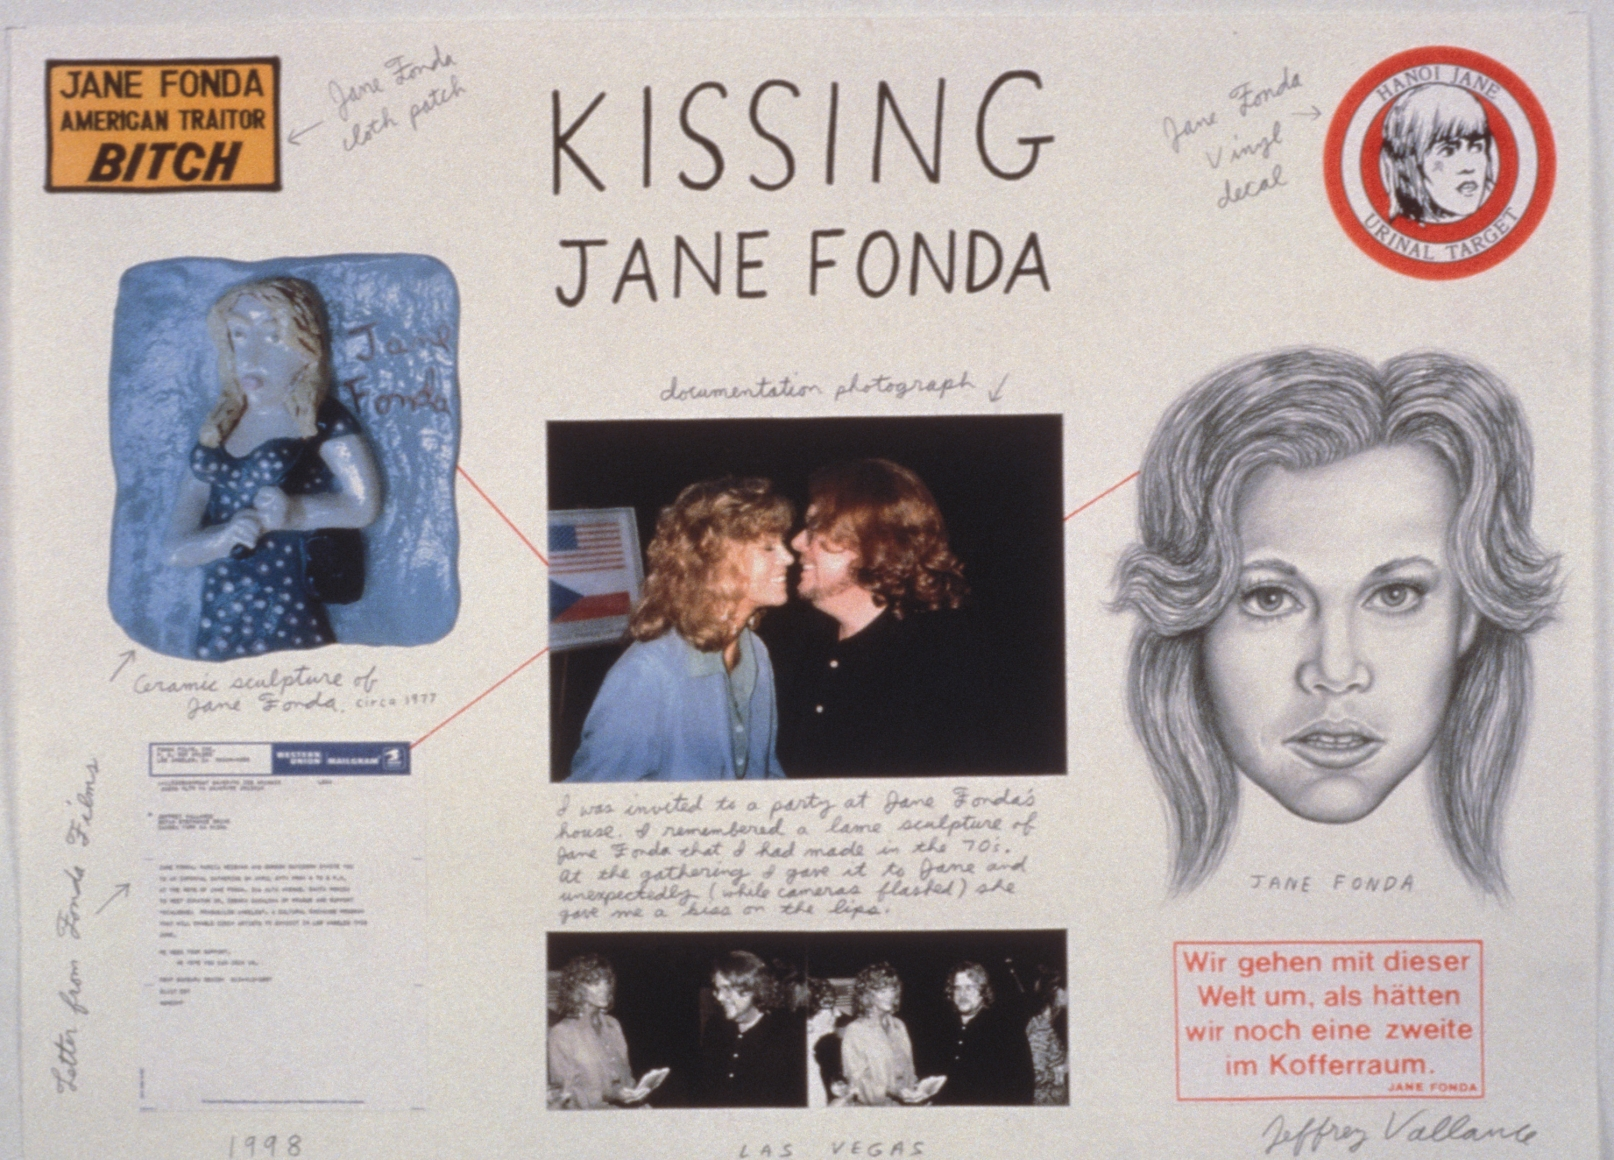 JEFFREY VALLANCE, Kissing Jane Fonda, 1998